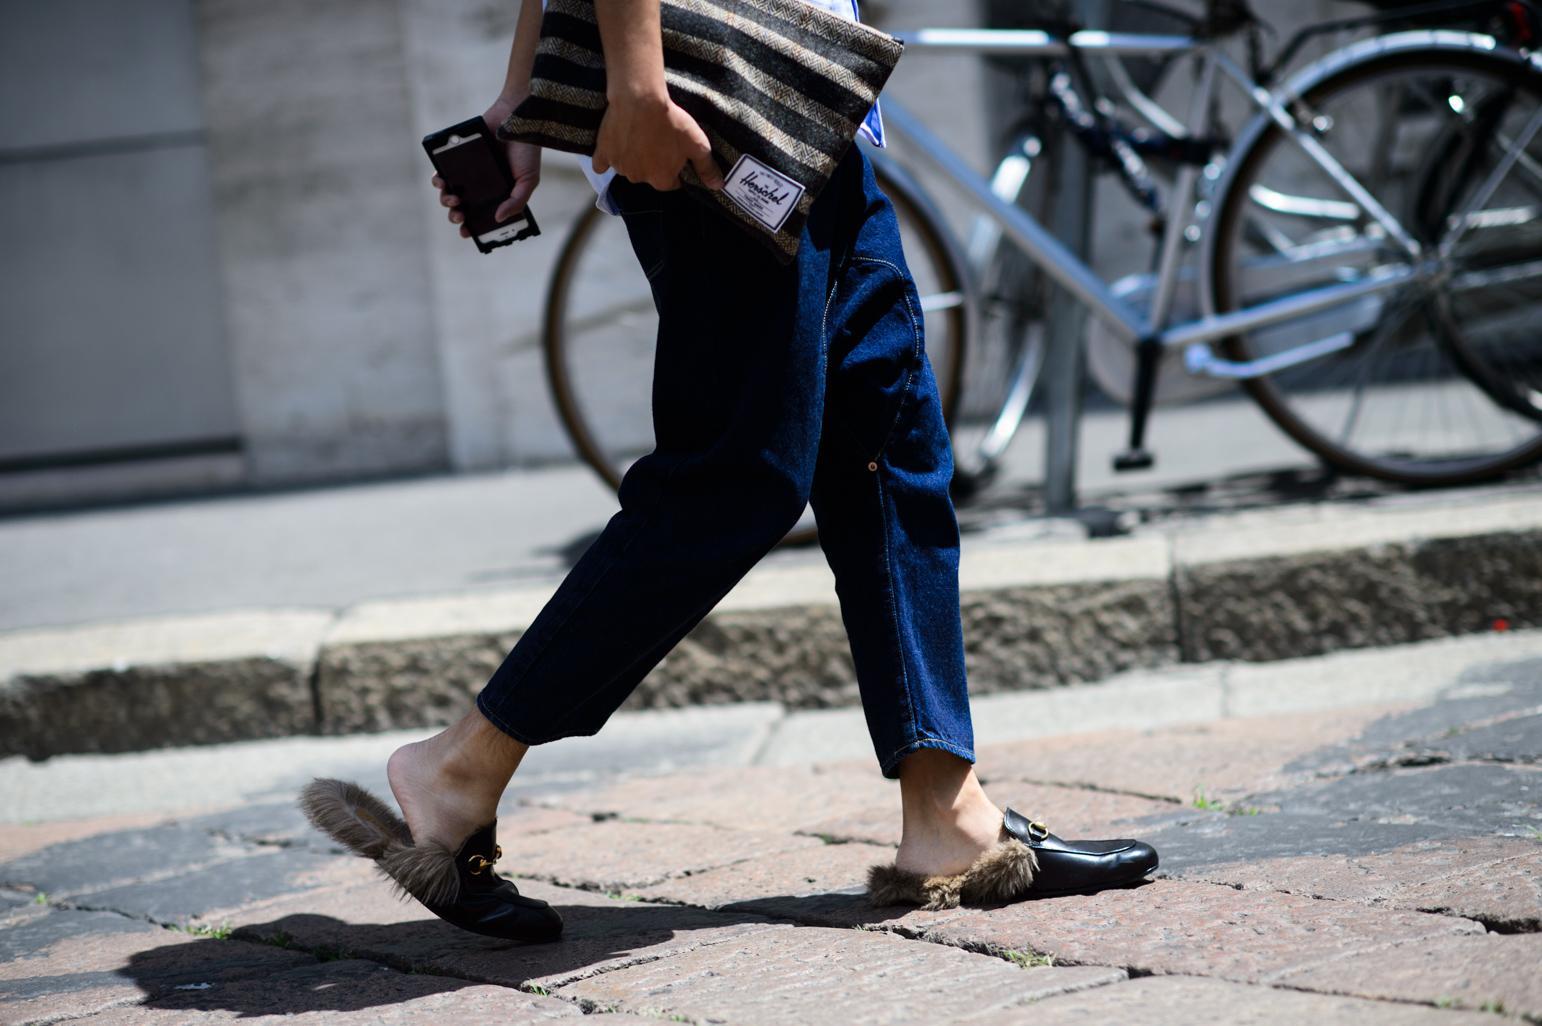 PSA: Mandals are in: http://t.co/jnaXPoD3dJ http://t.co/AQBTQDIhyD